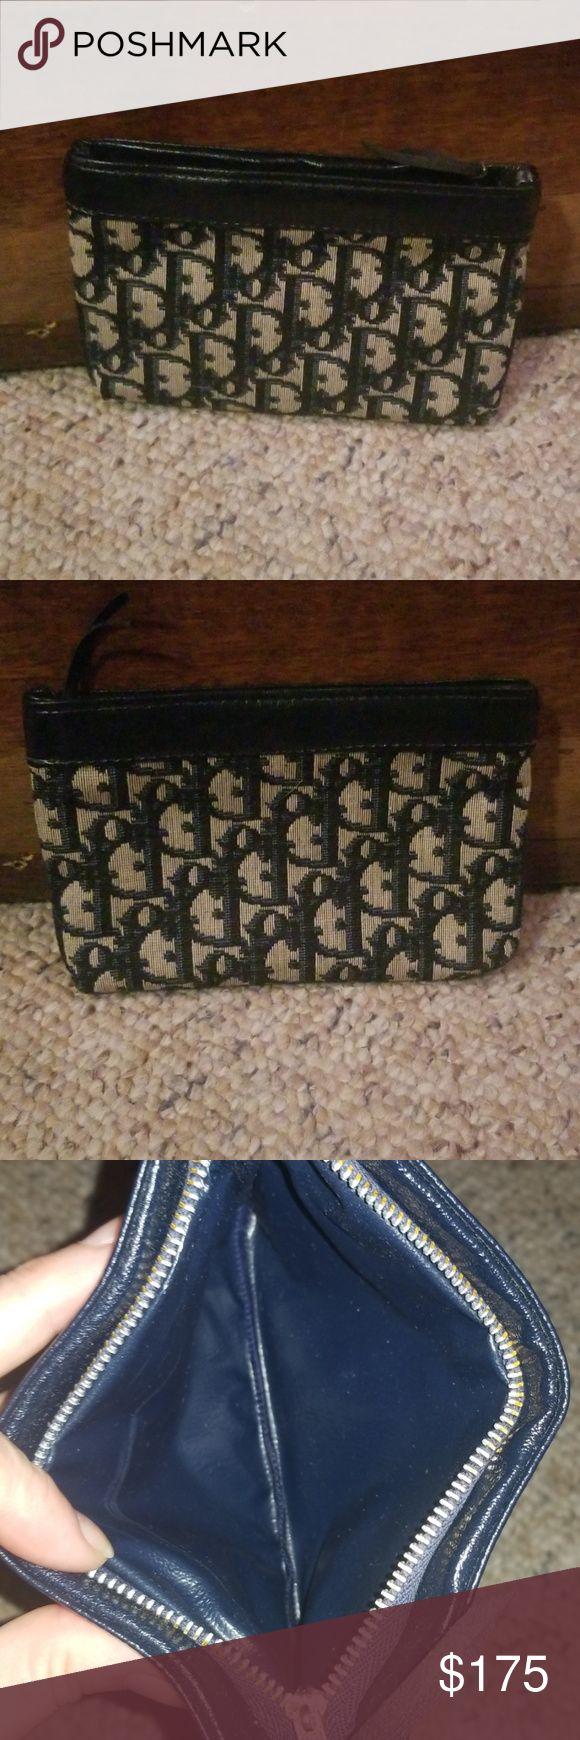 Vintage Christian Dior makeup bag or coin purse Mint